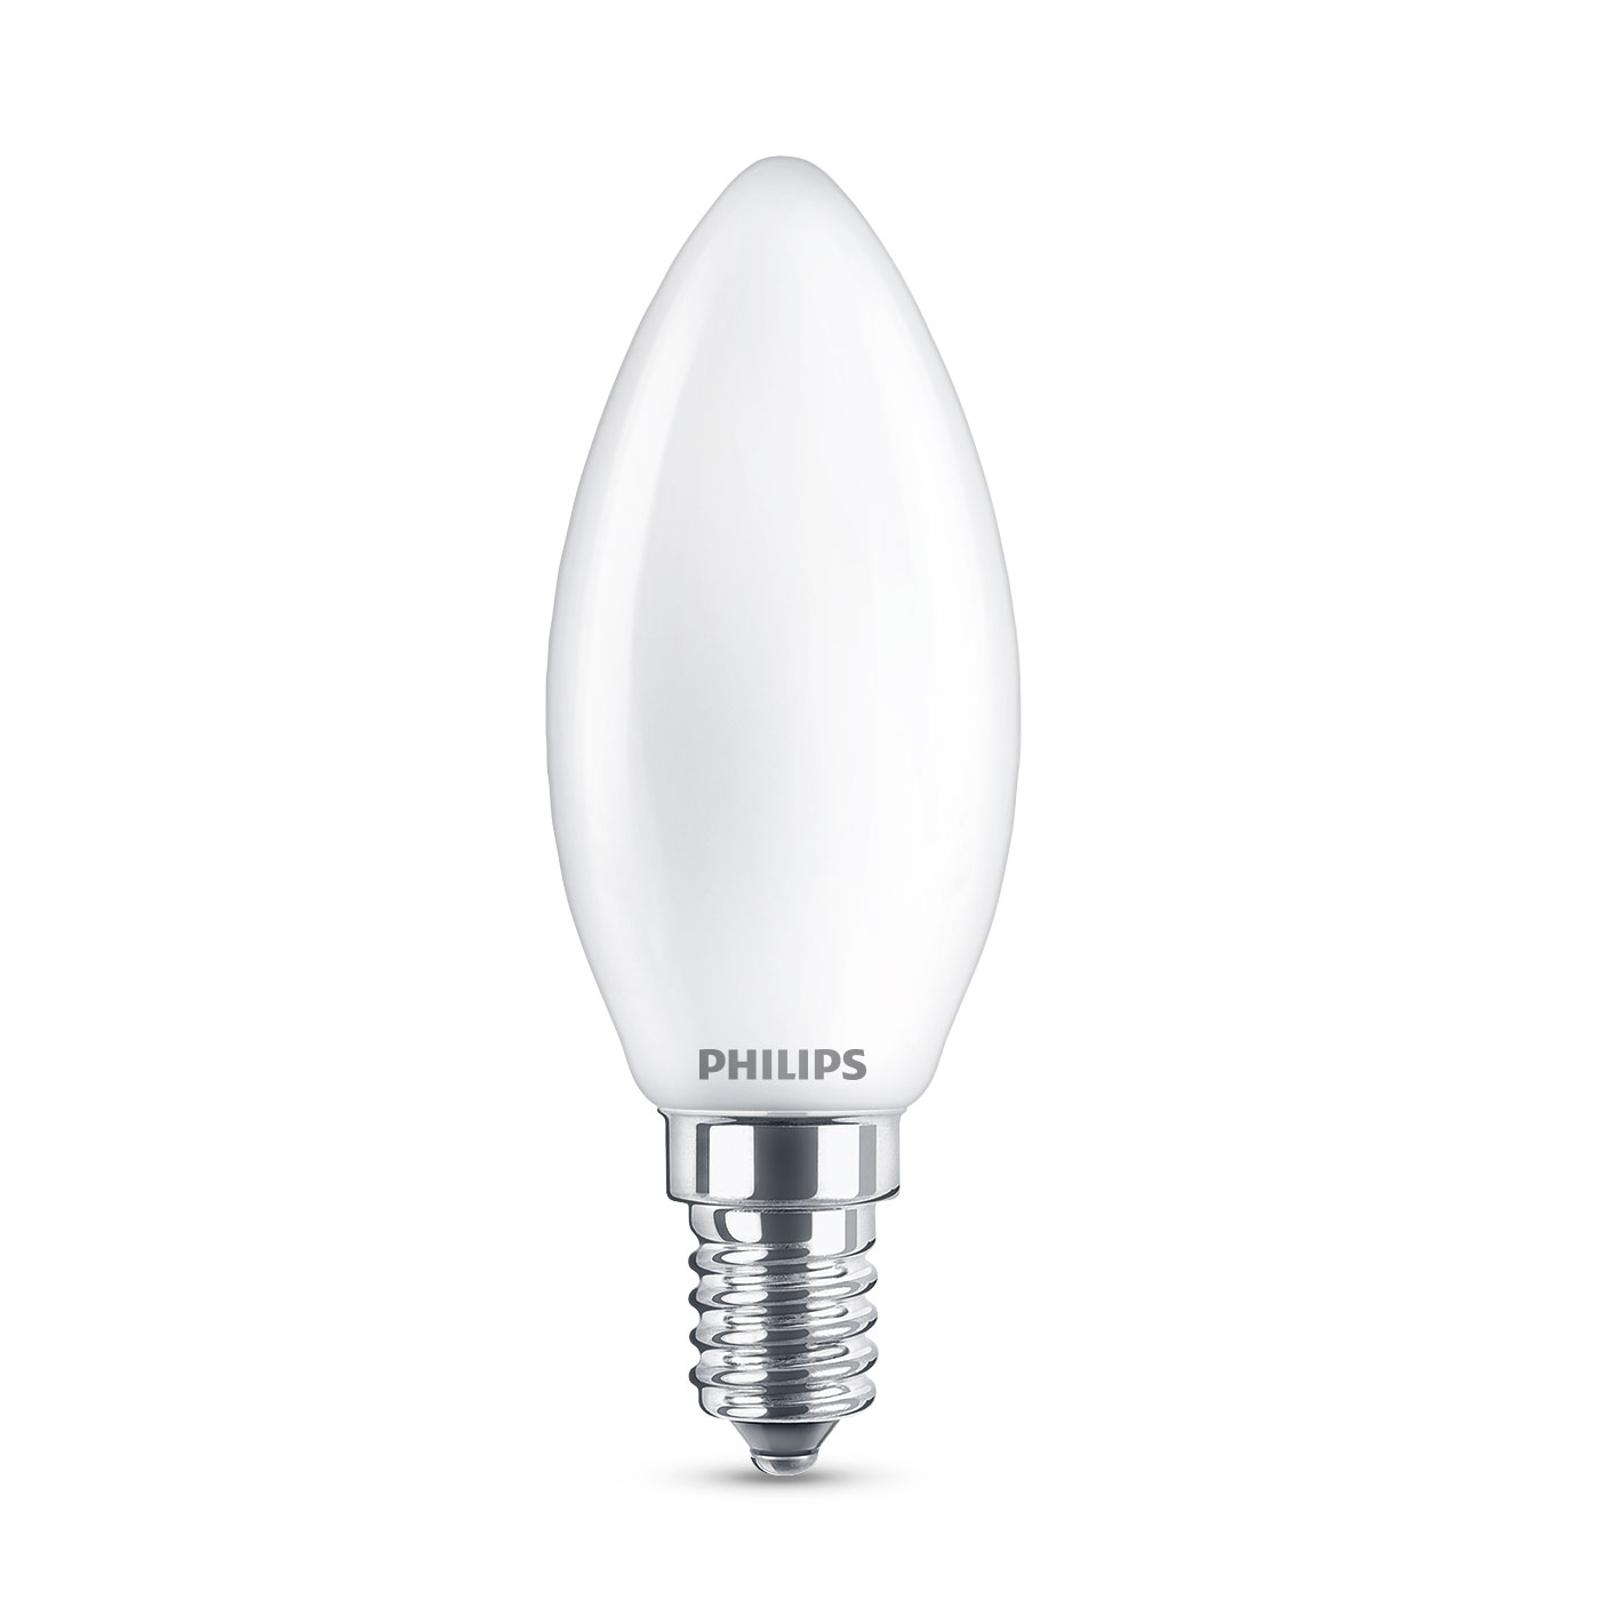 Philips Classic LED-Lampe E14 B35 6,5W matt 4.000K